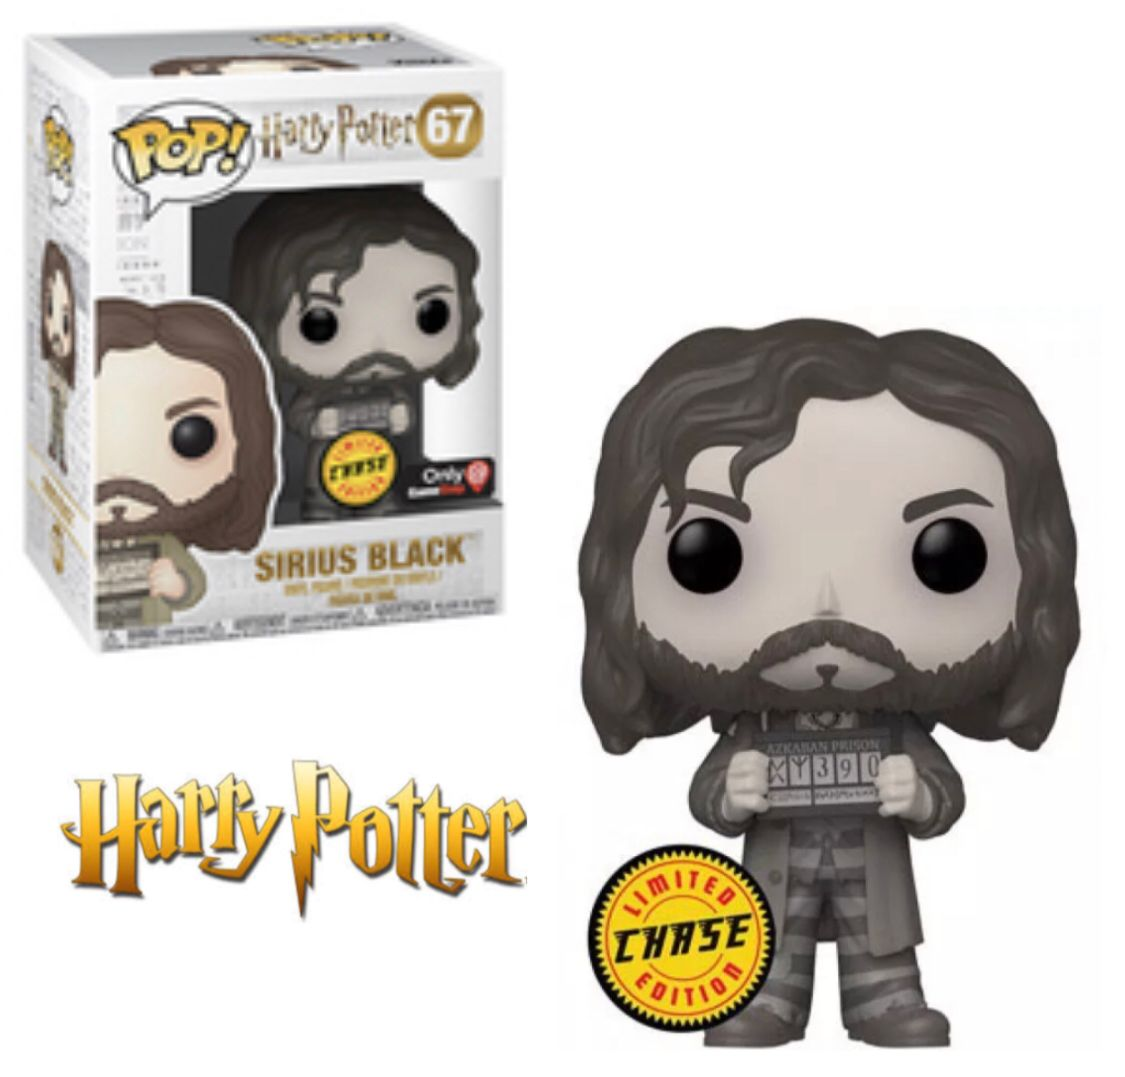 Harry Potter 6570 Sirius Black Pop Vinyl